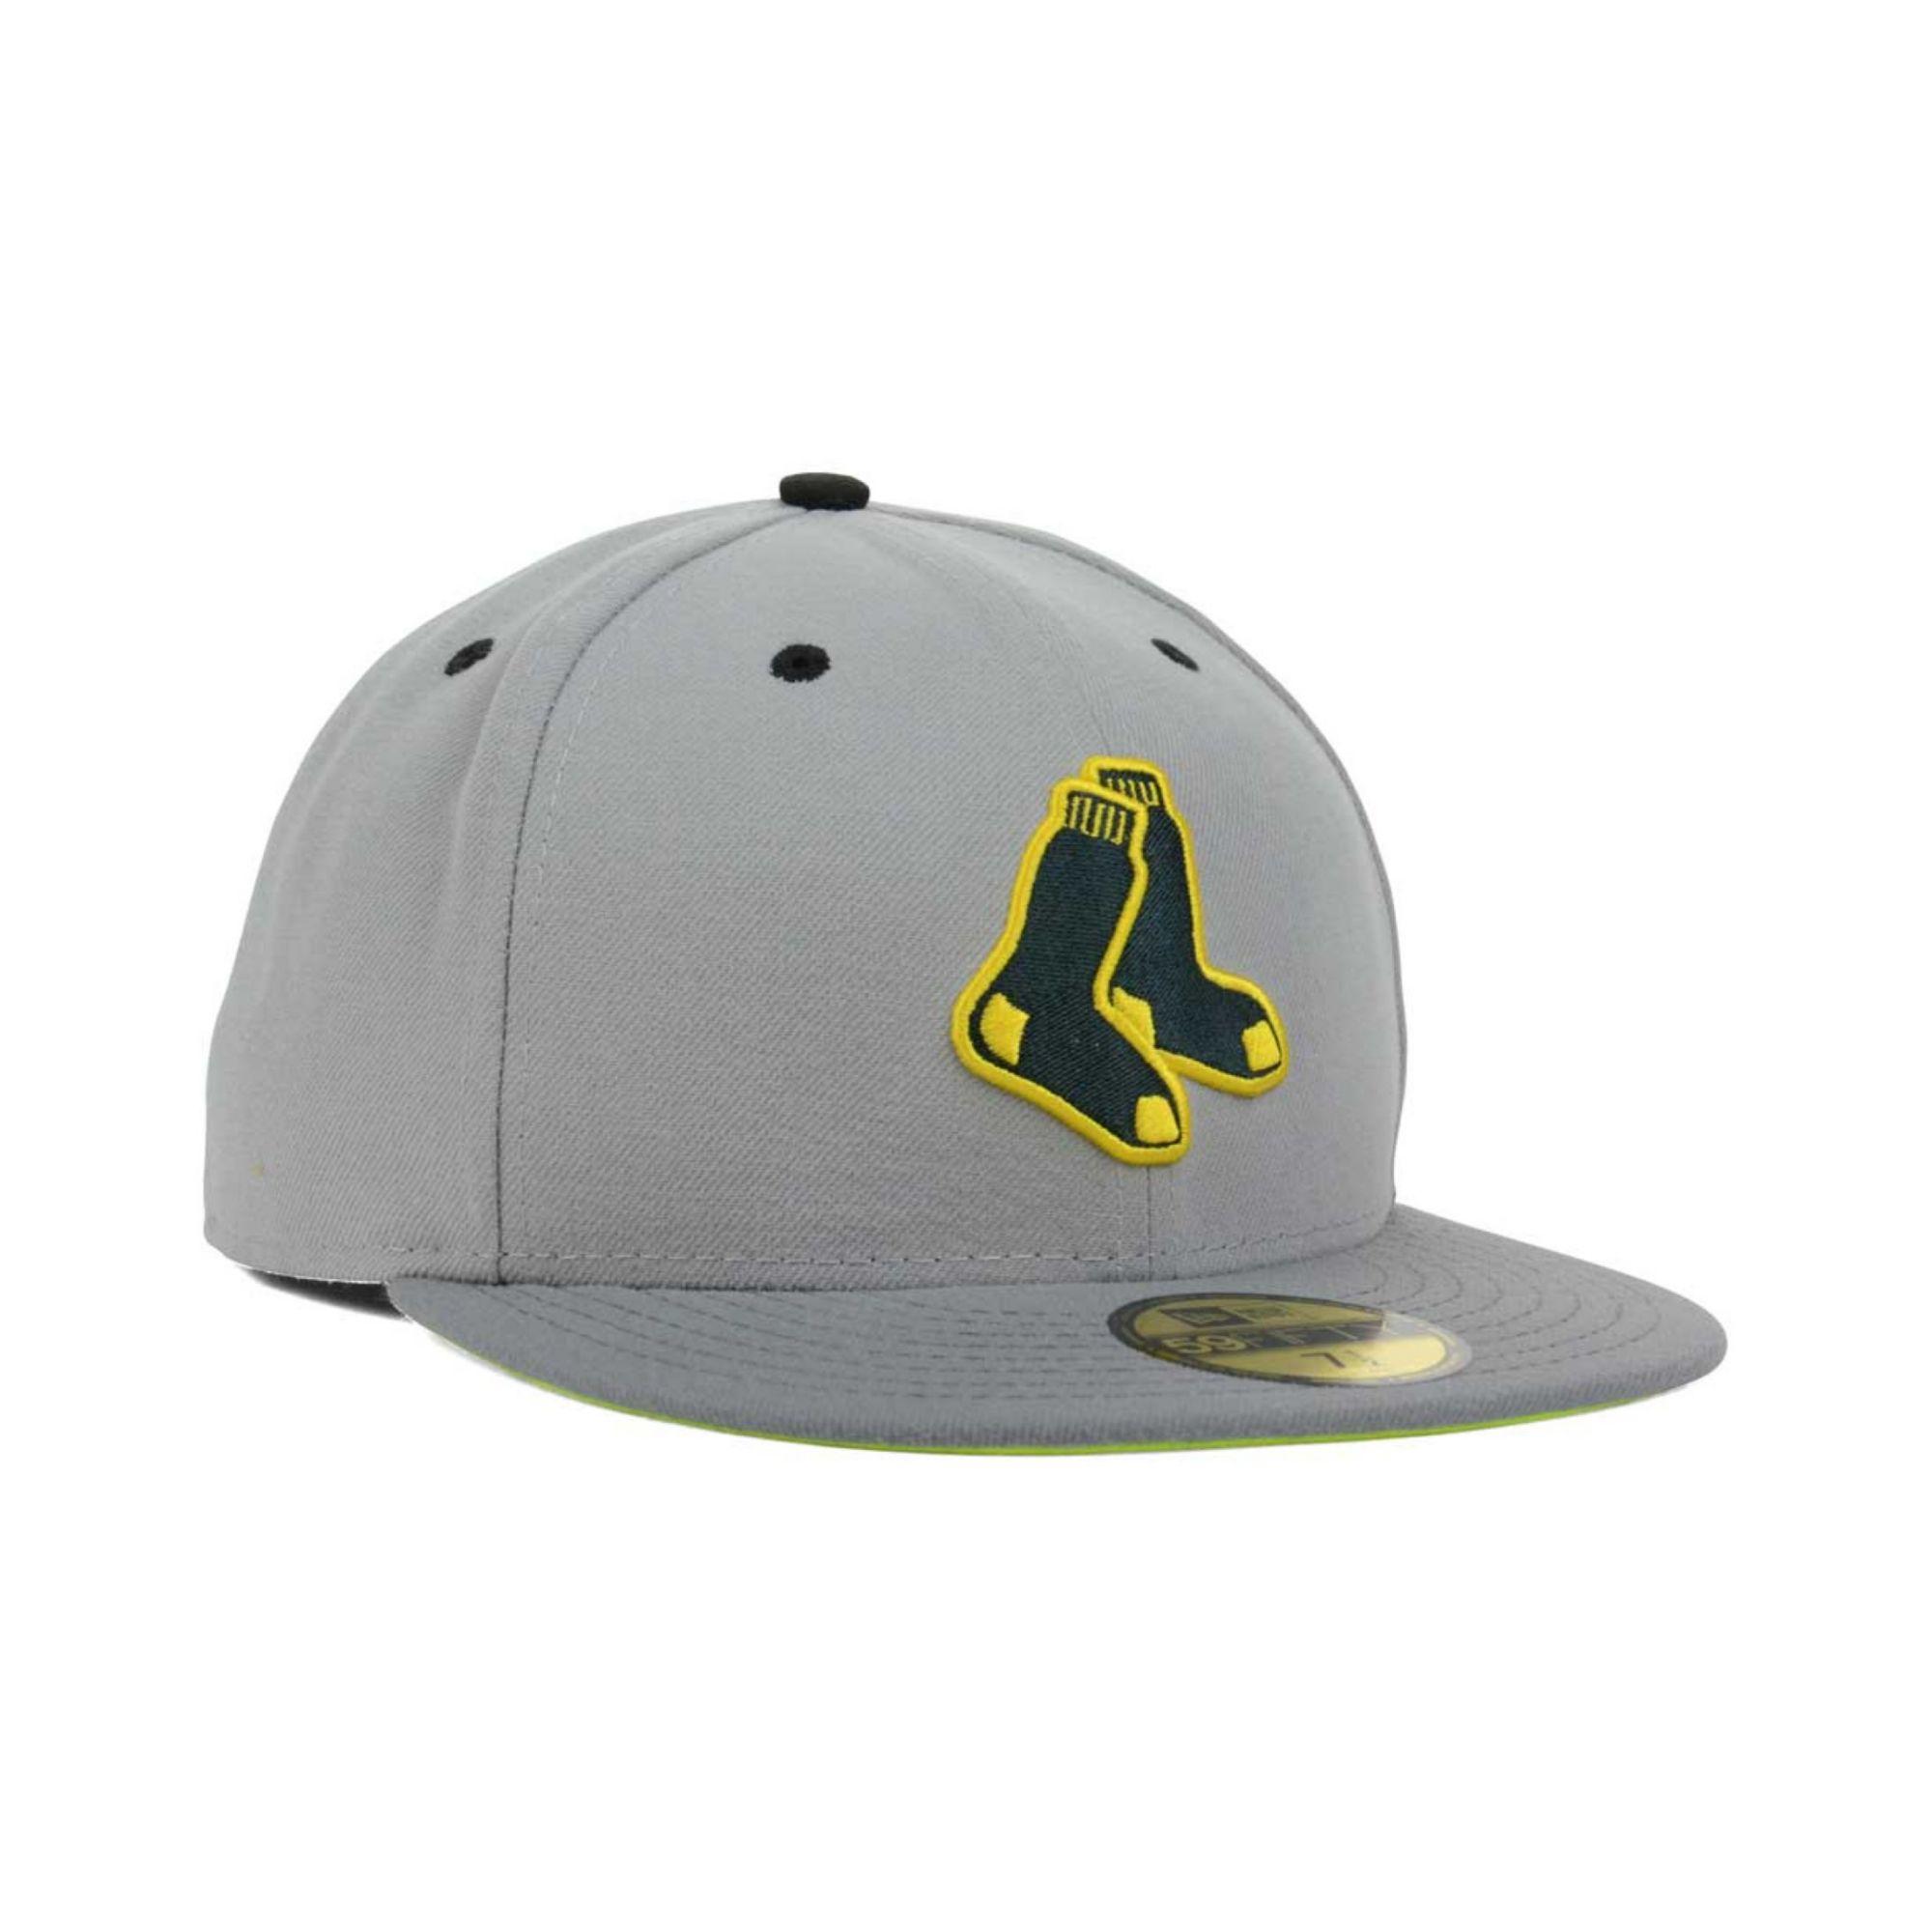 best service 28e92 cca5c KTZ Boston Red Sox Mlb Gvolt 59fifty Cap in Gray for Men - Lyst